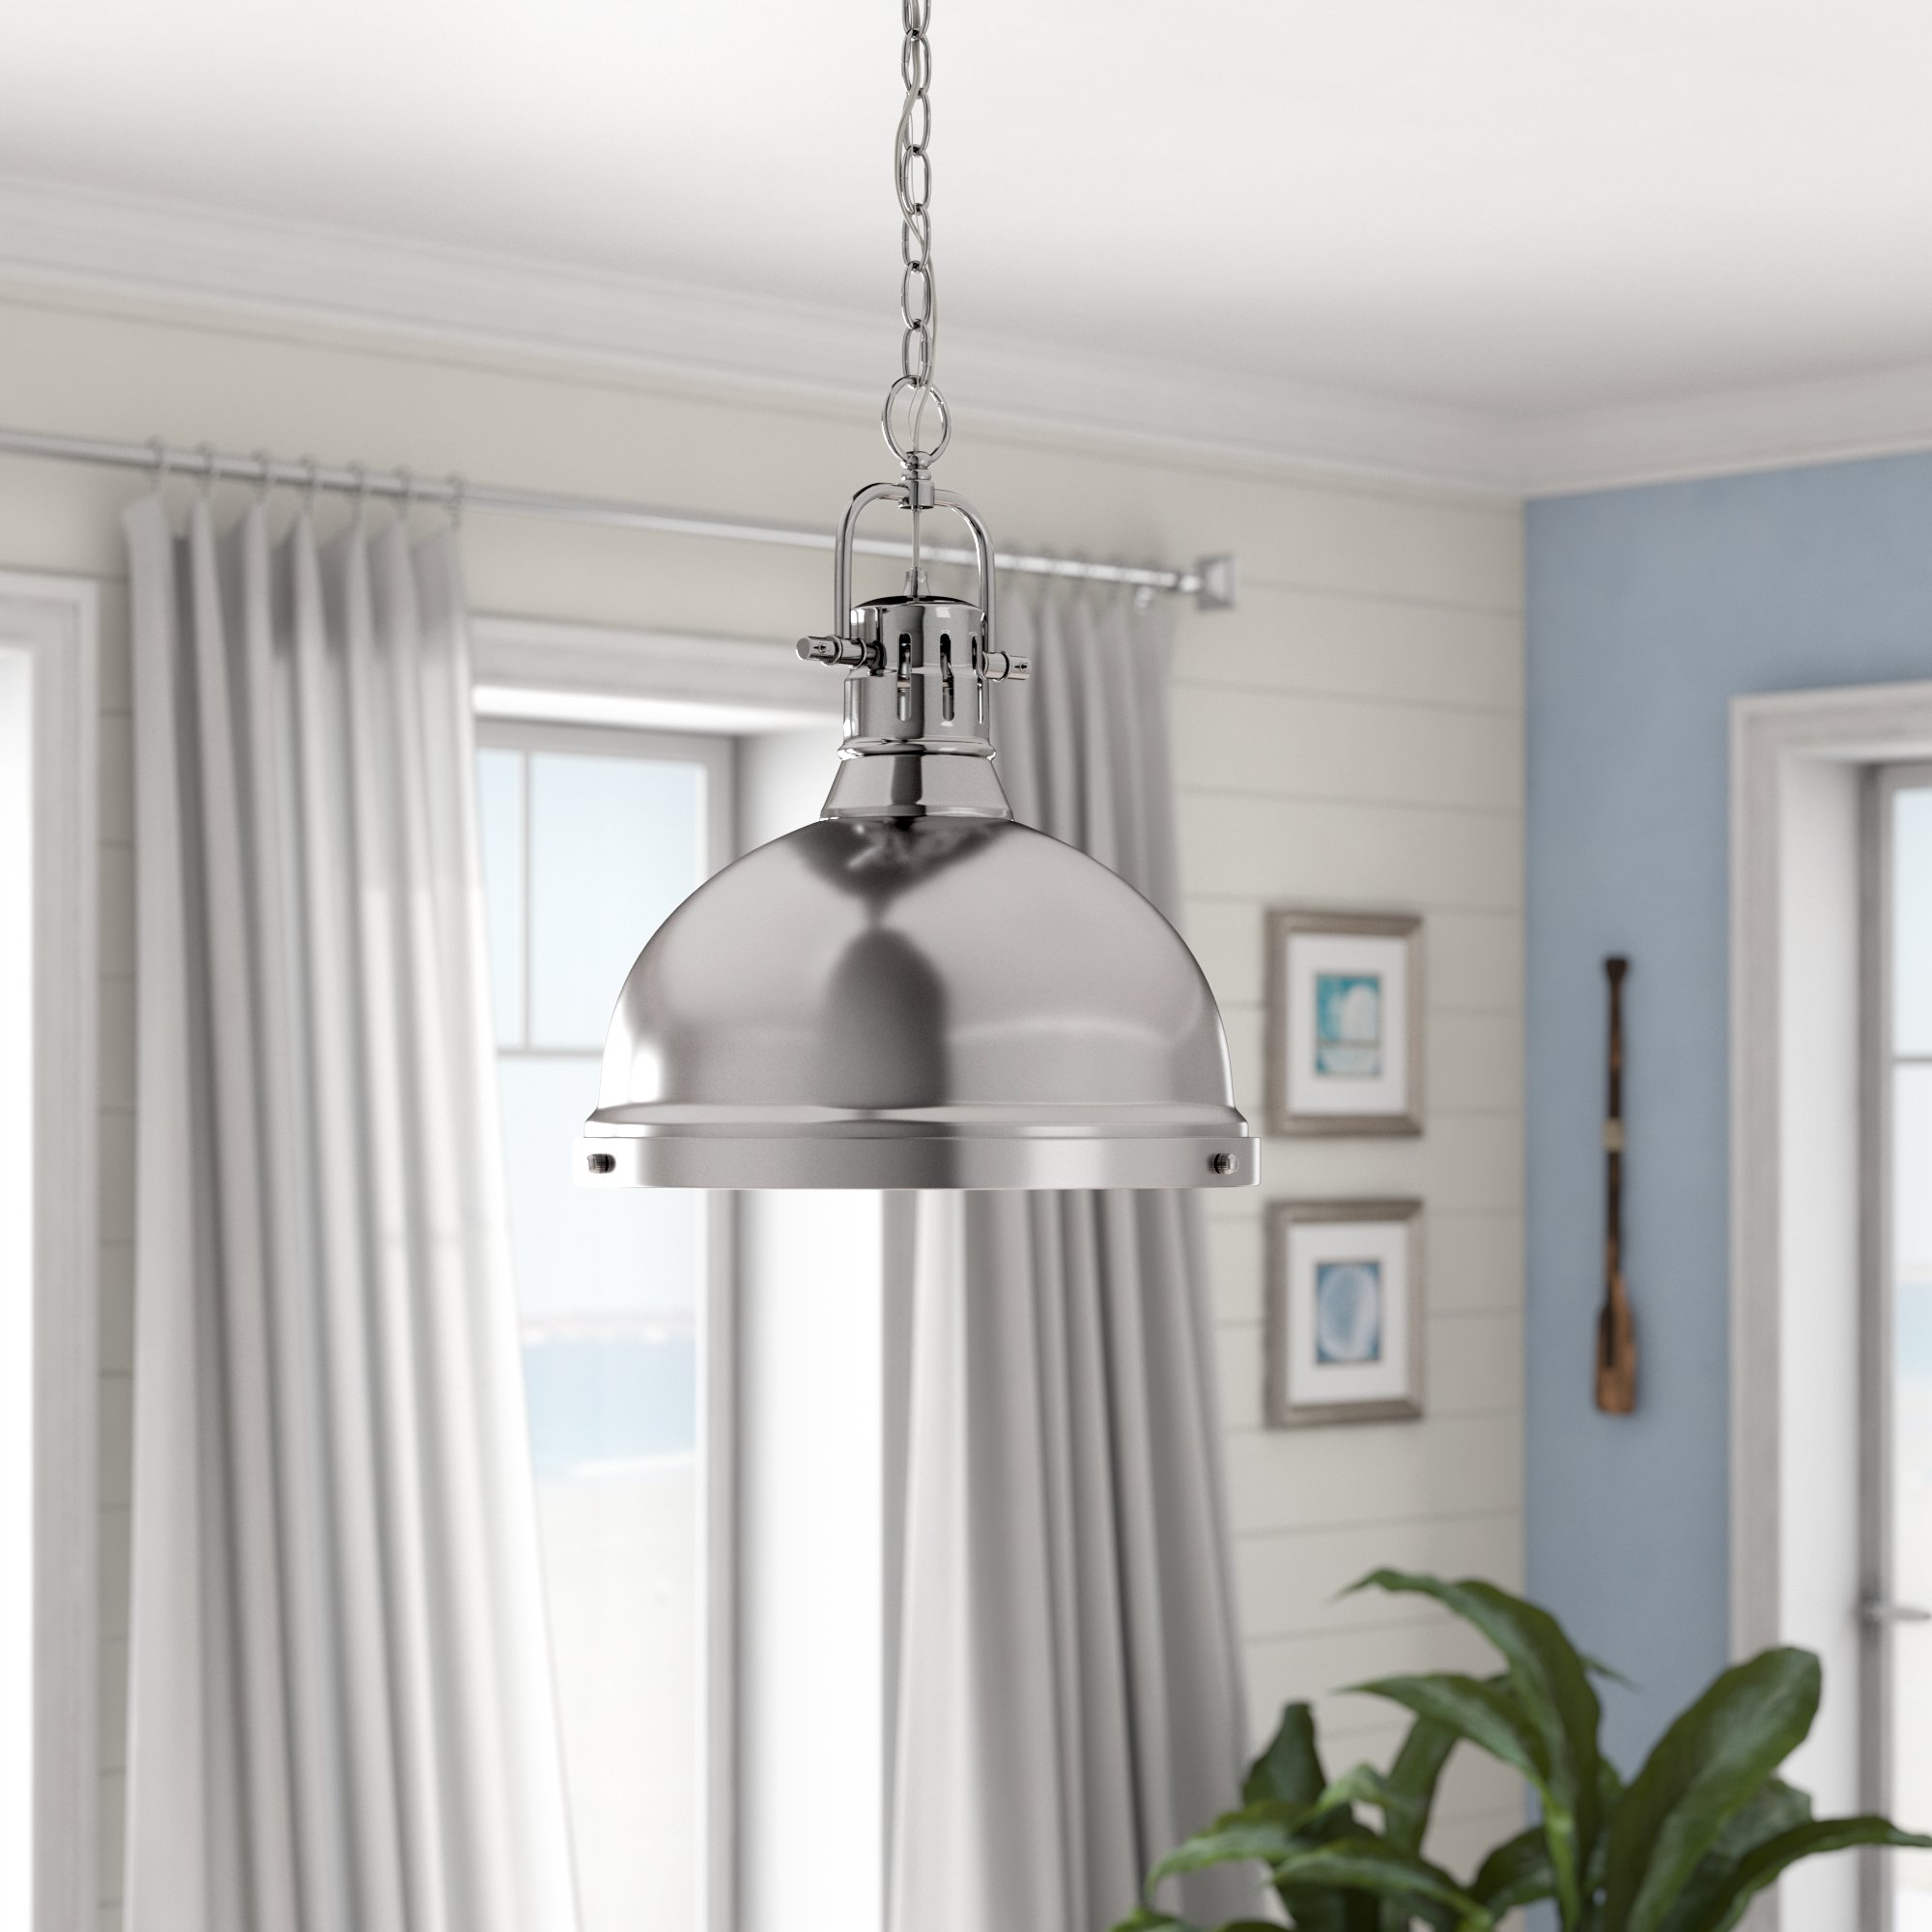 Bodalla 1 Light Single Bell Pendants With Newest Bodalla 1 Light Single Dome Pendant (View 20 of 20)